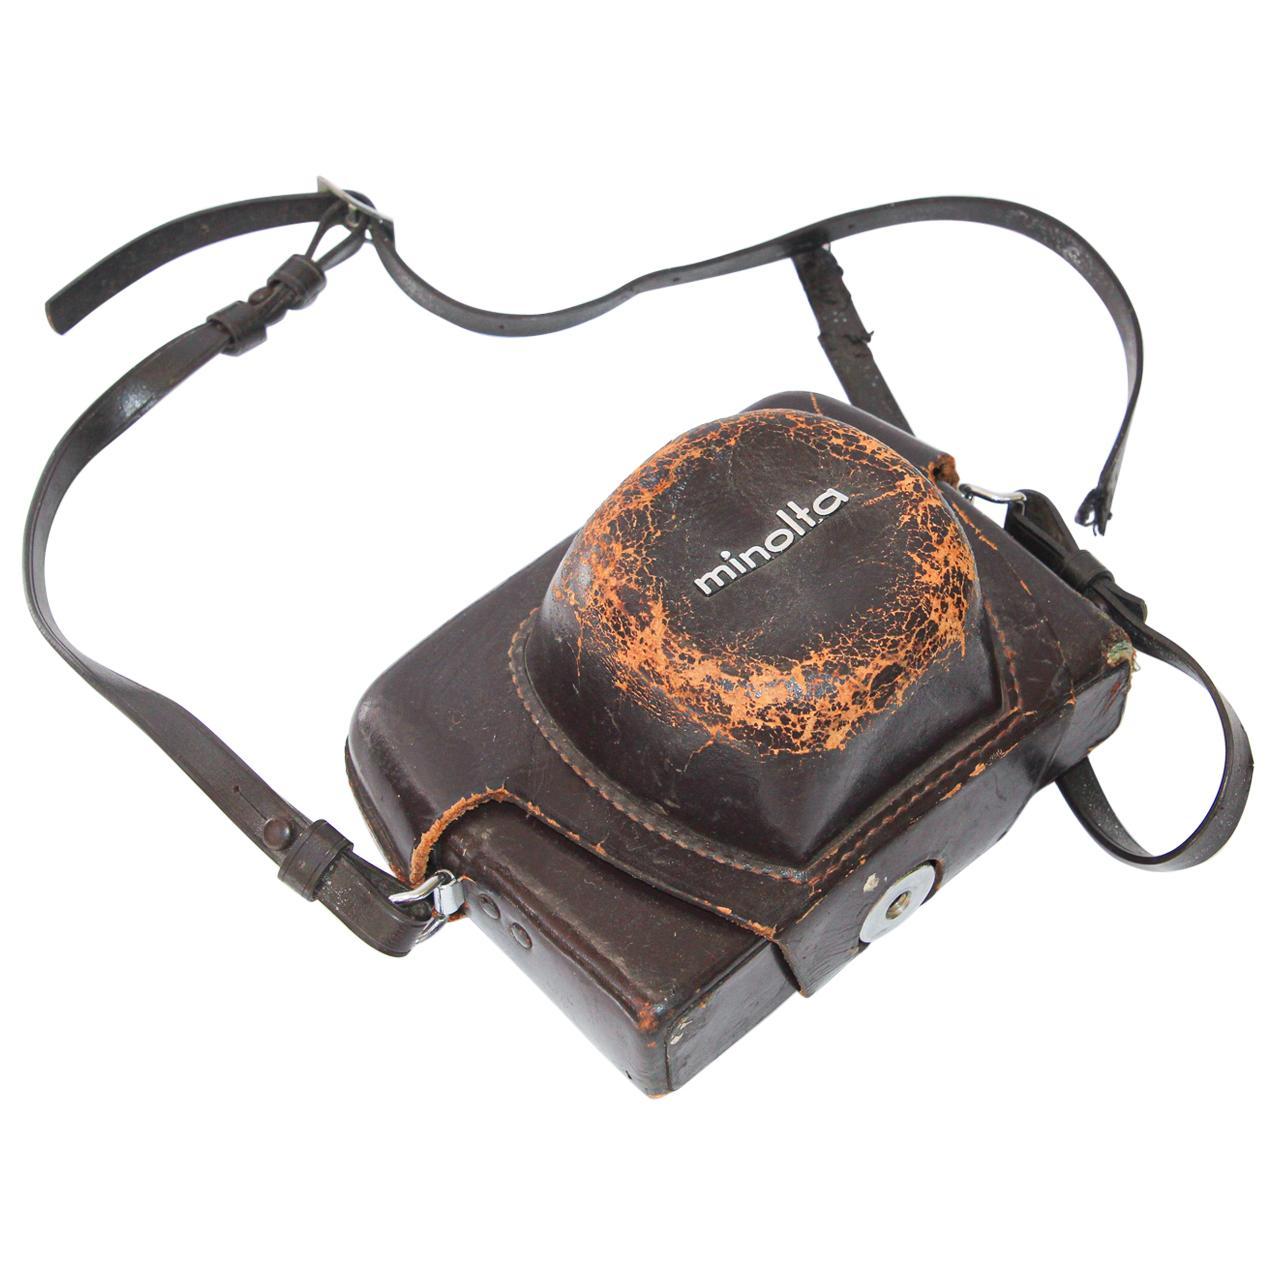 Vintage Minolta HI-MATIC 7 Film Camera with Leather Case